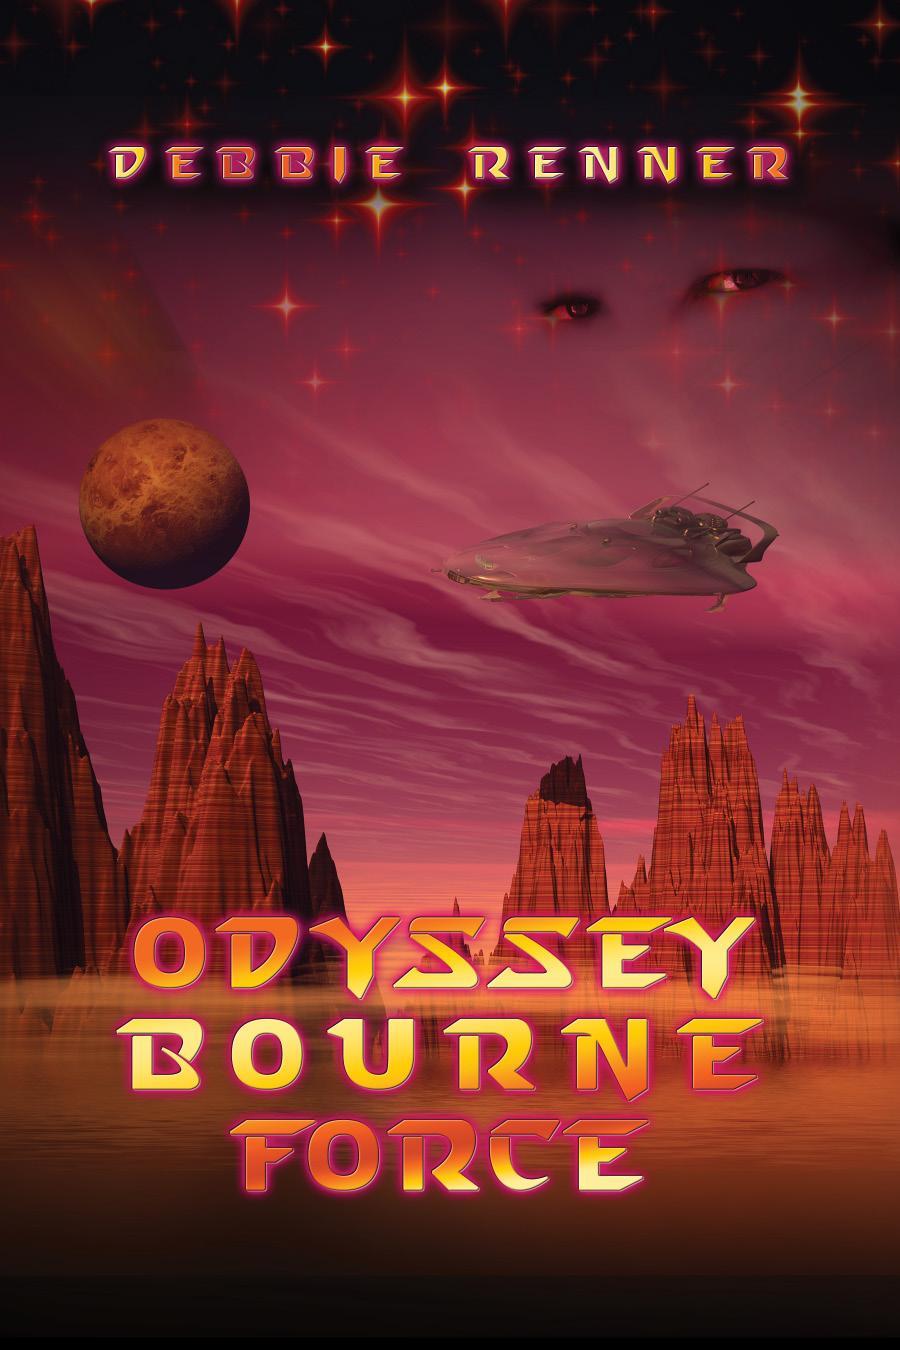 Odyssey Bourne Force